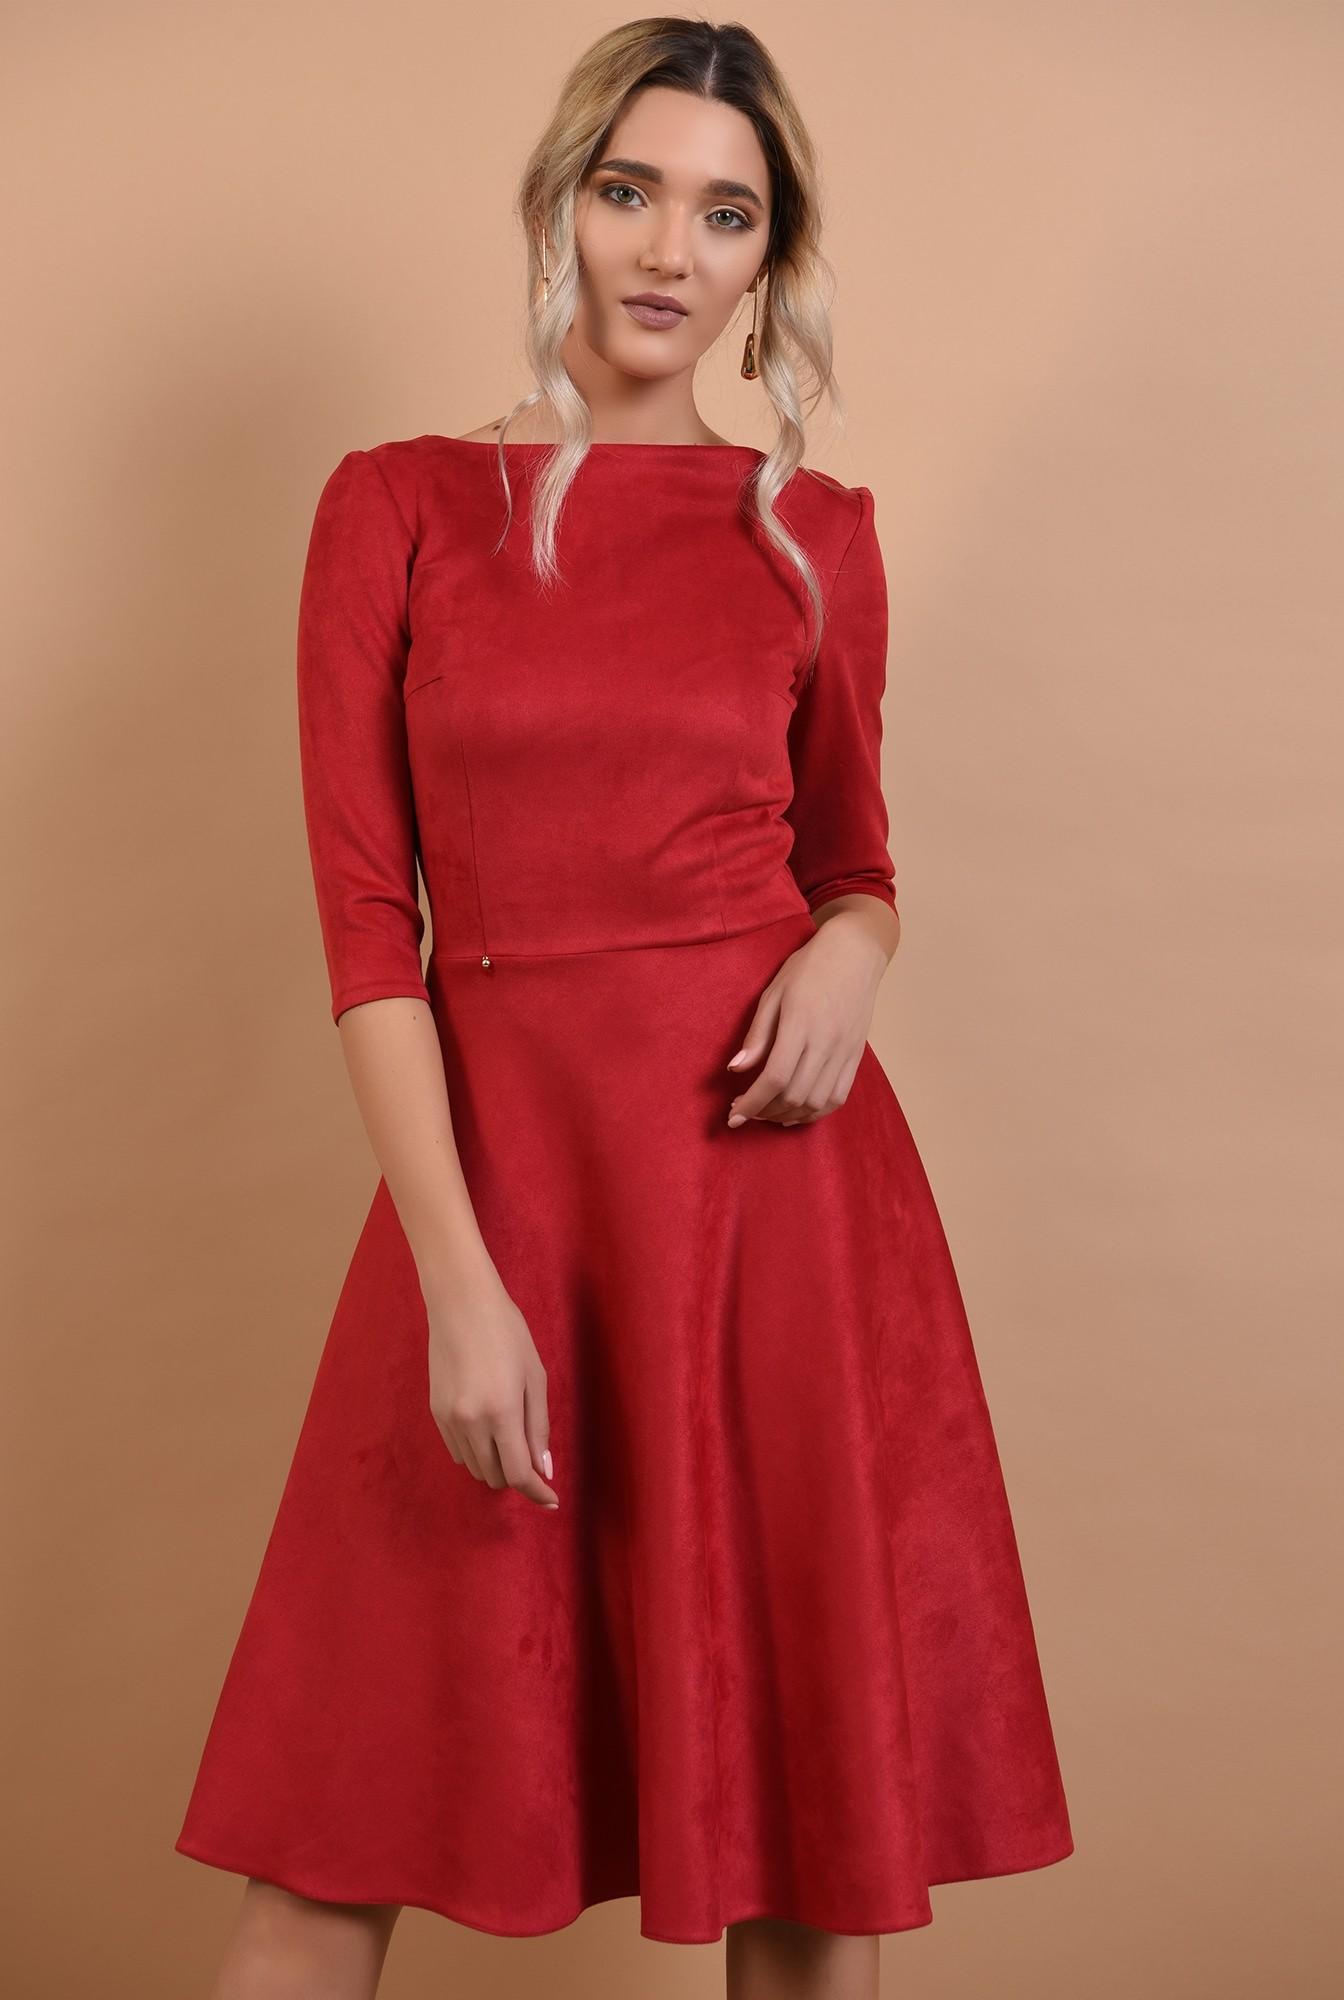 2 - rochie rosie, din piele intoarsa, maneci midi, nasturi aurii la spate, Poema